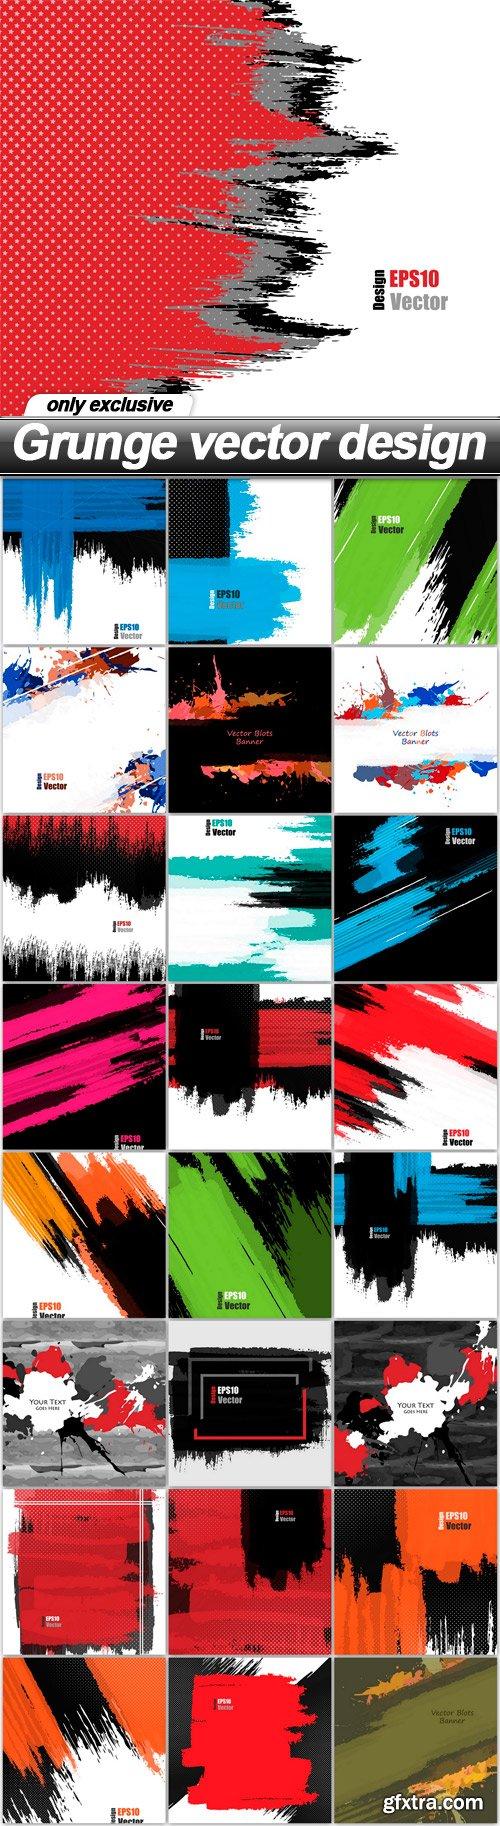 Grunge vector design - 25 EPS